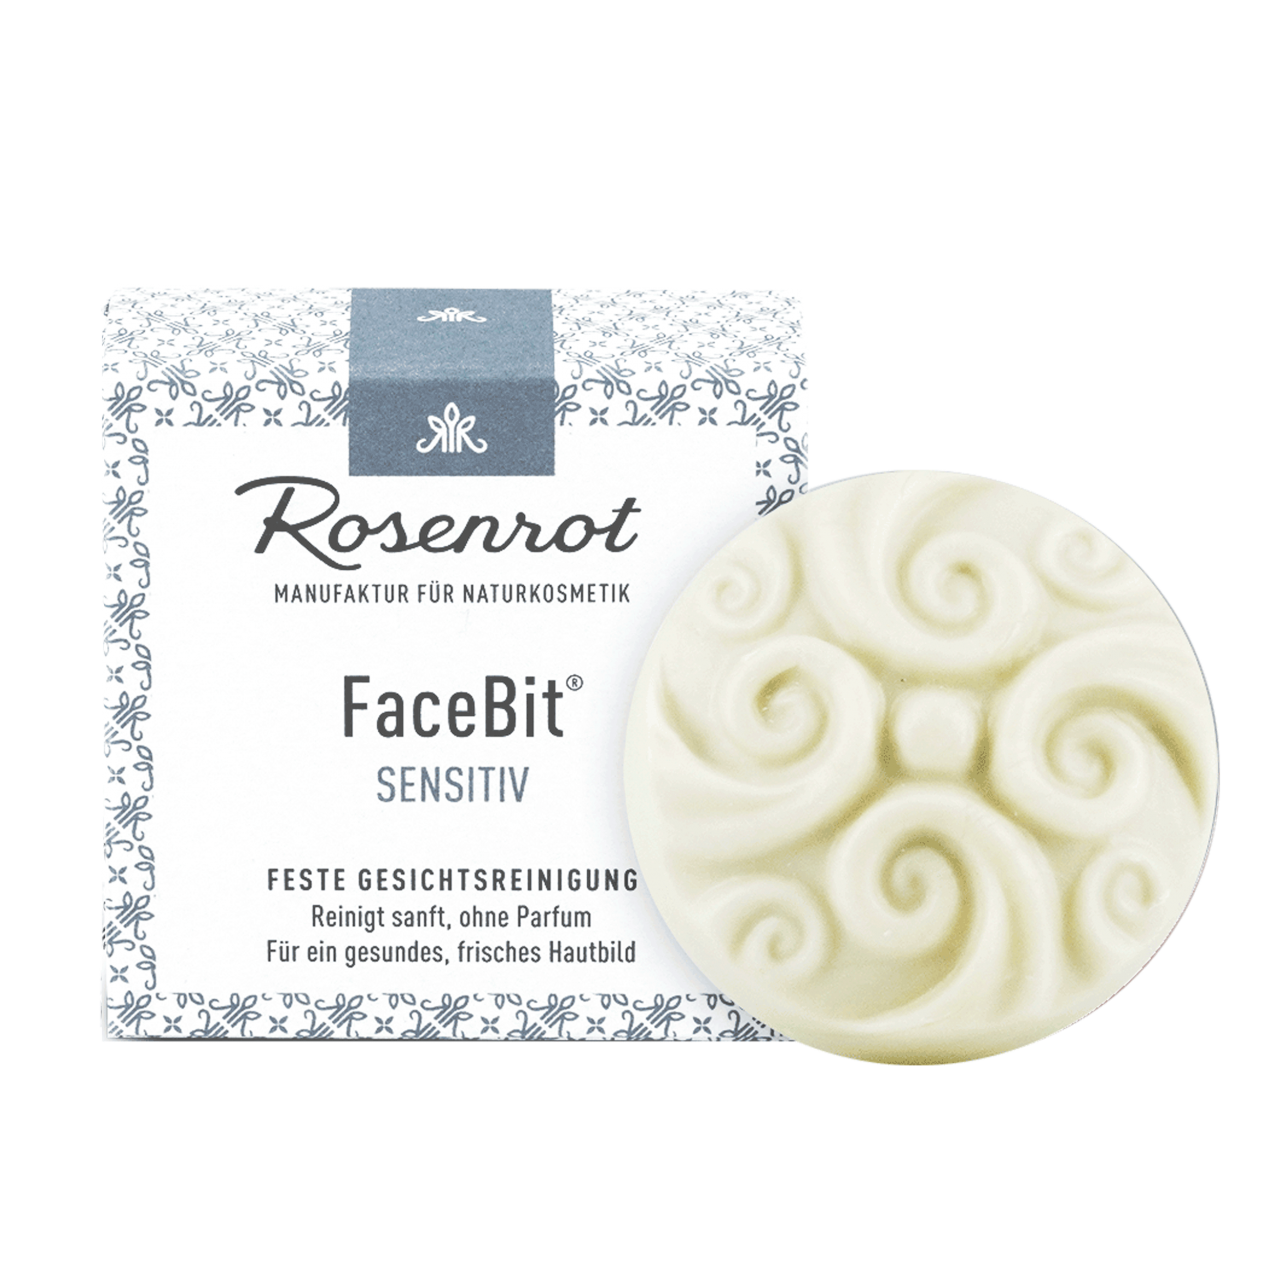 FaceBit® - Solid Wash Gel Facial Cleansing - Sensitiv